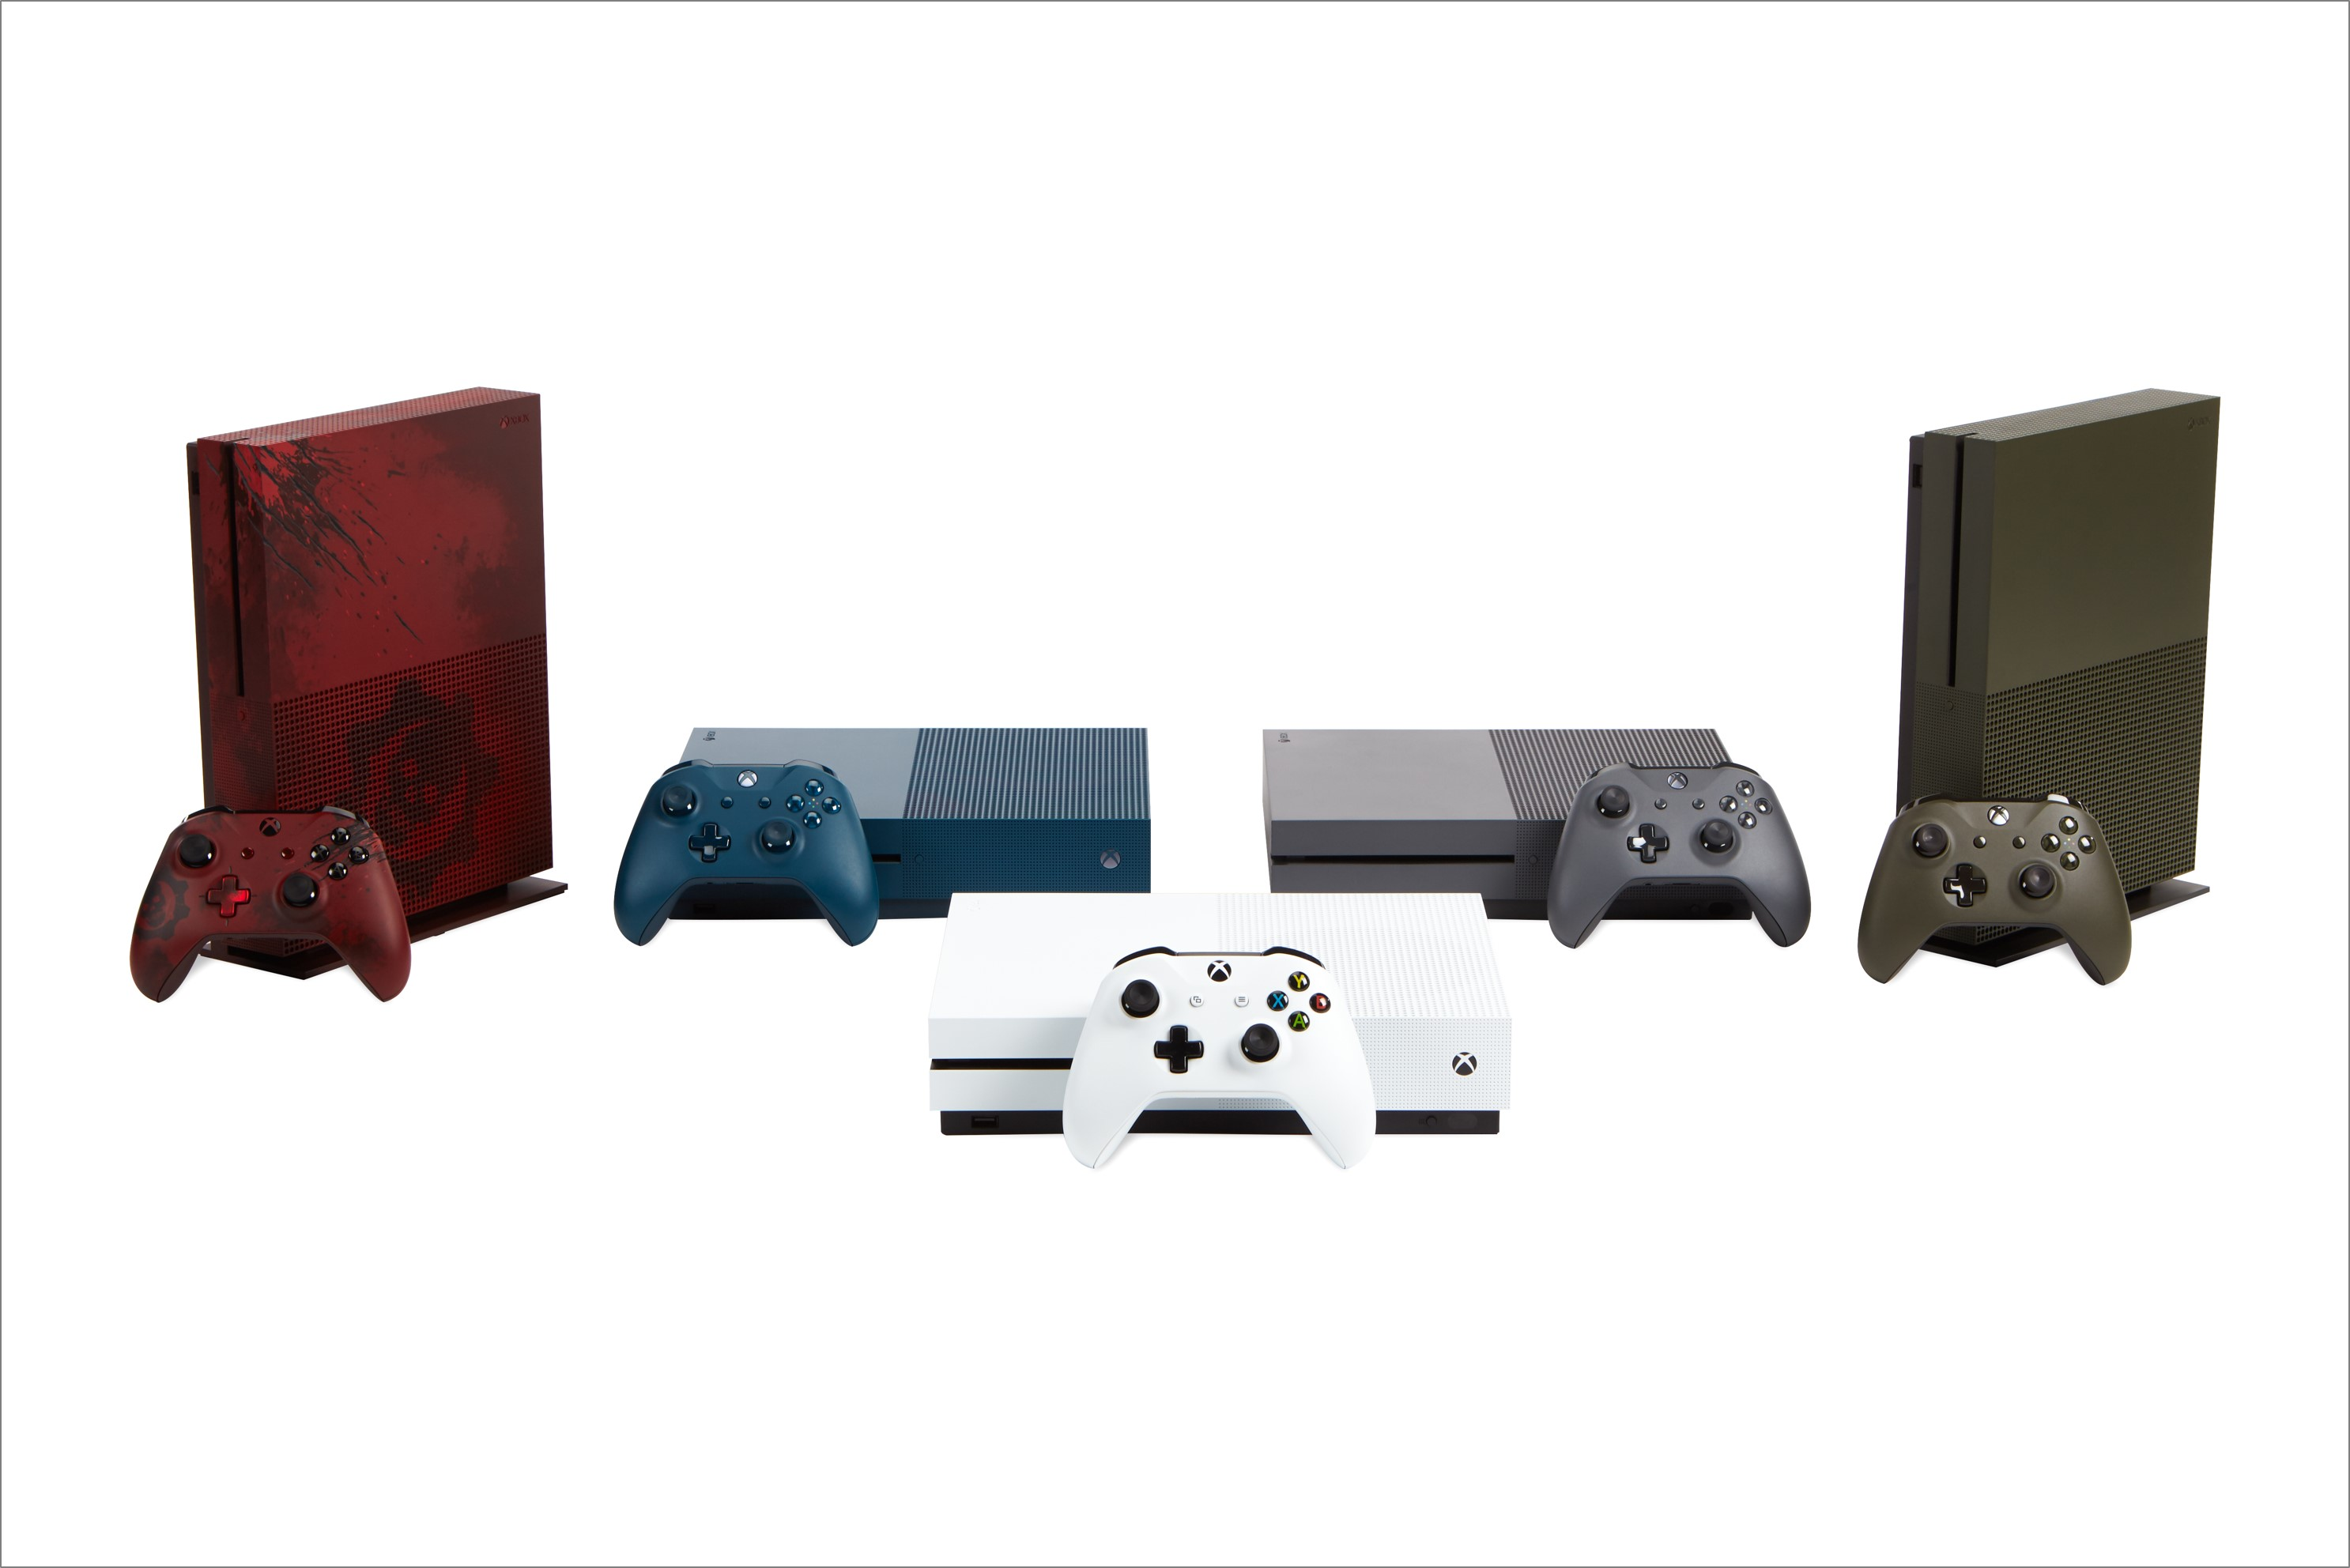 Amazing eBay Cyber Monday PS4 Pro & Xbox One S 1TB Deals